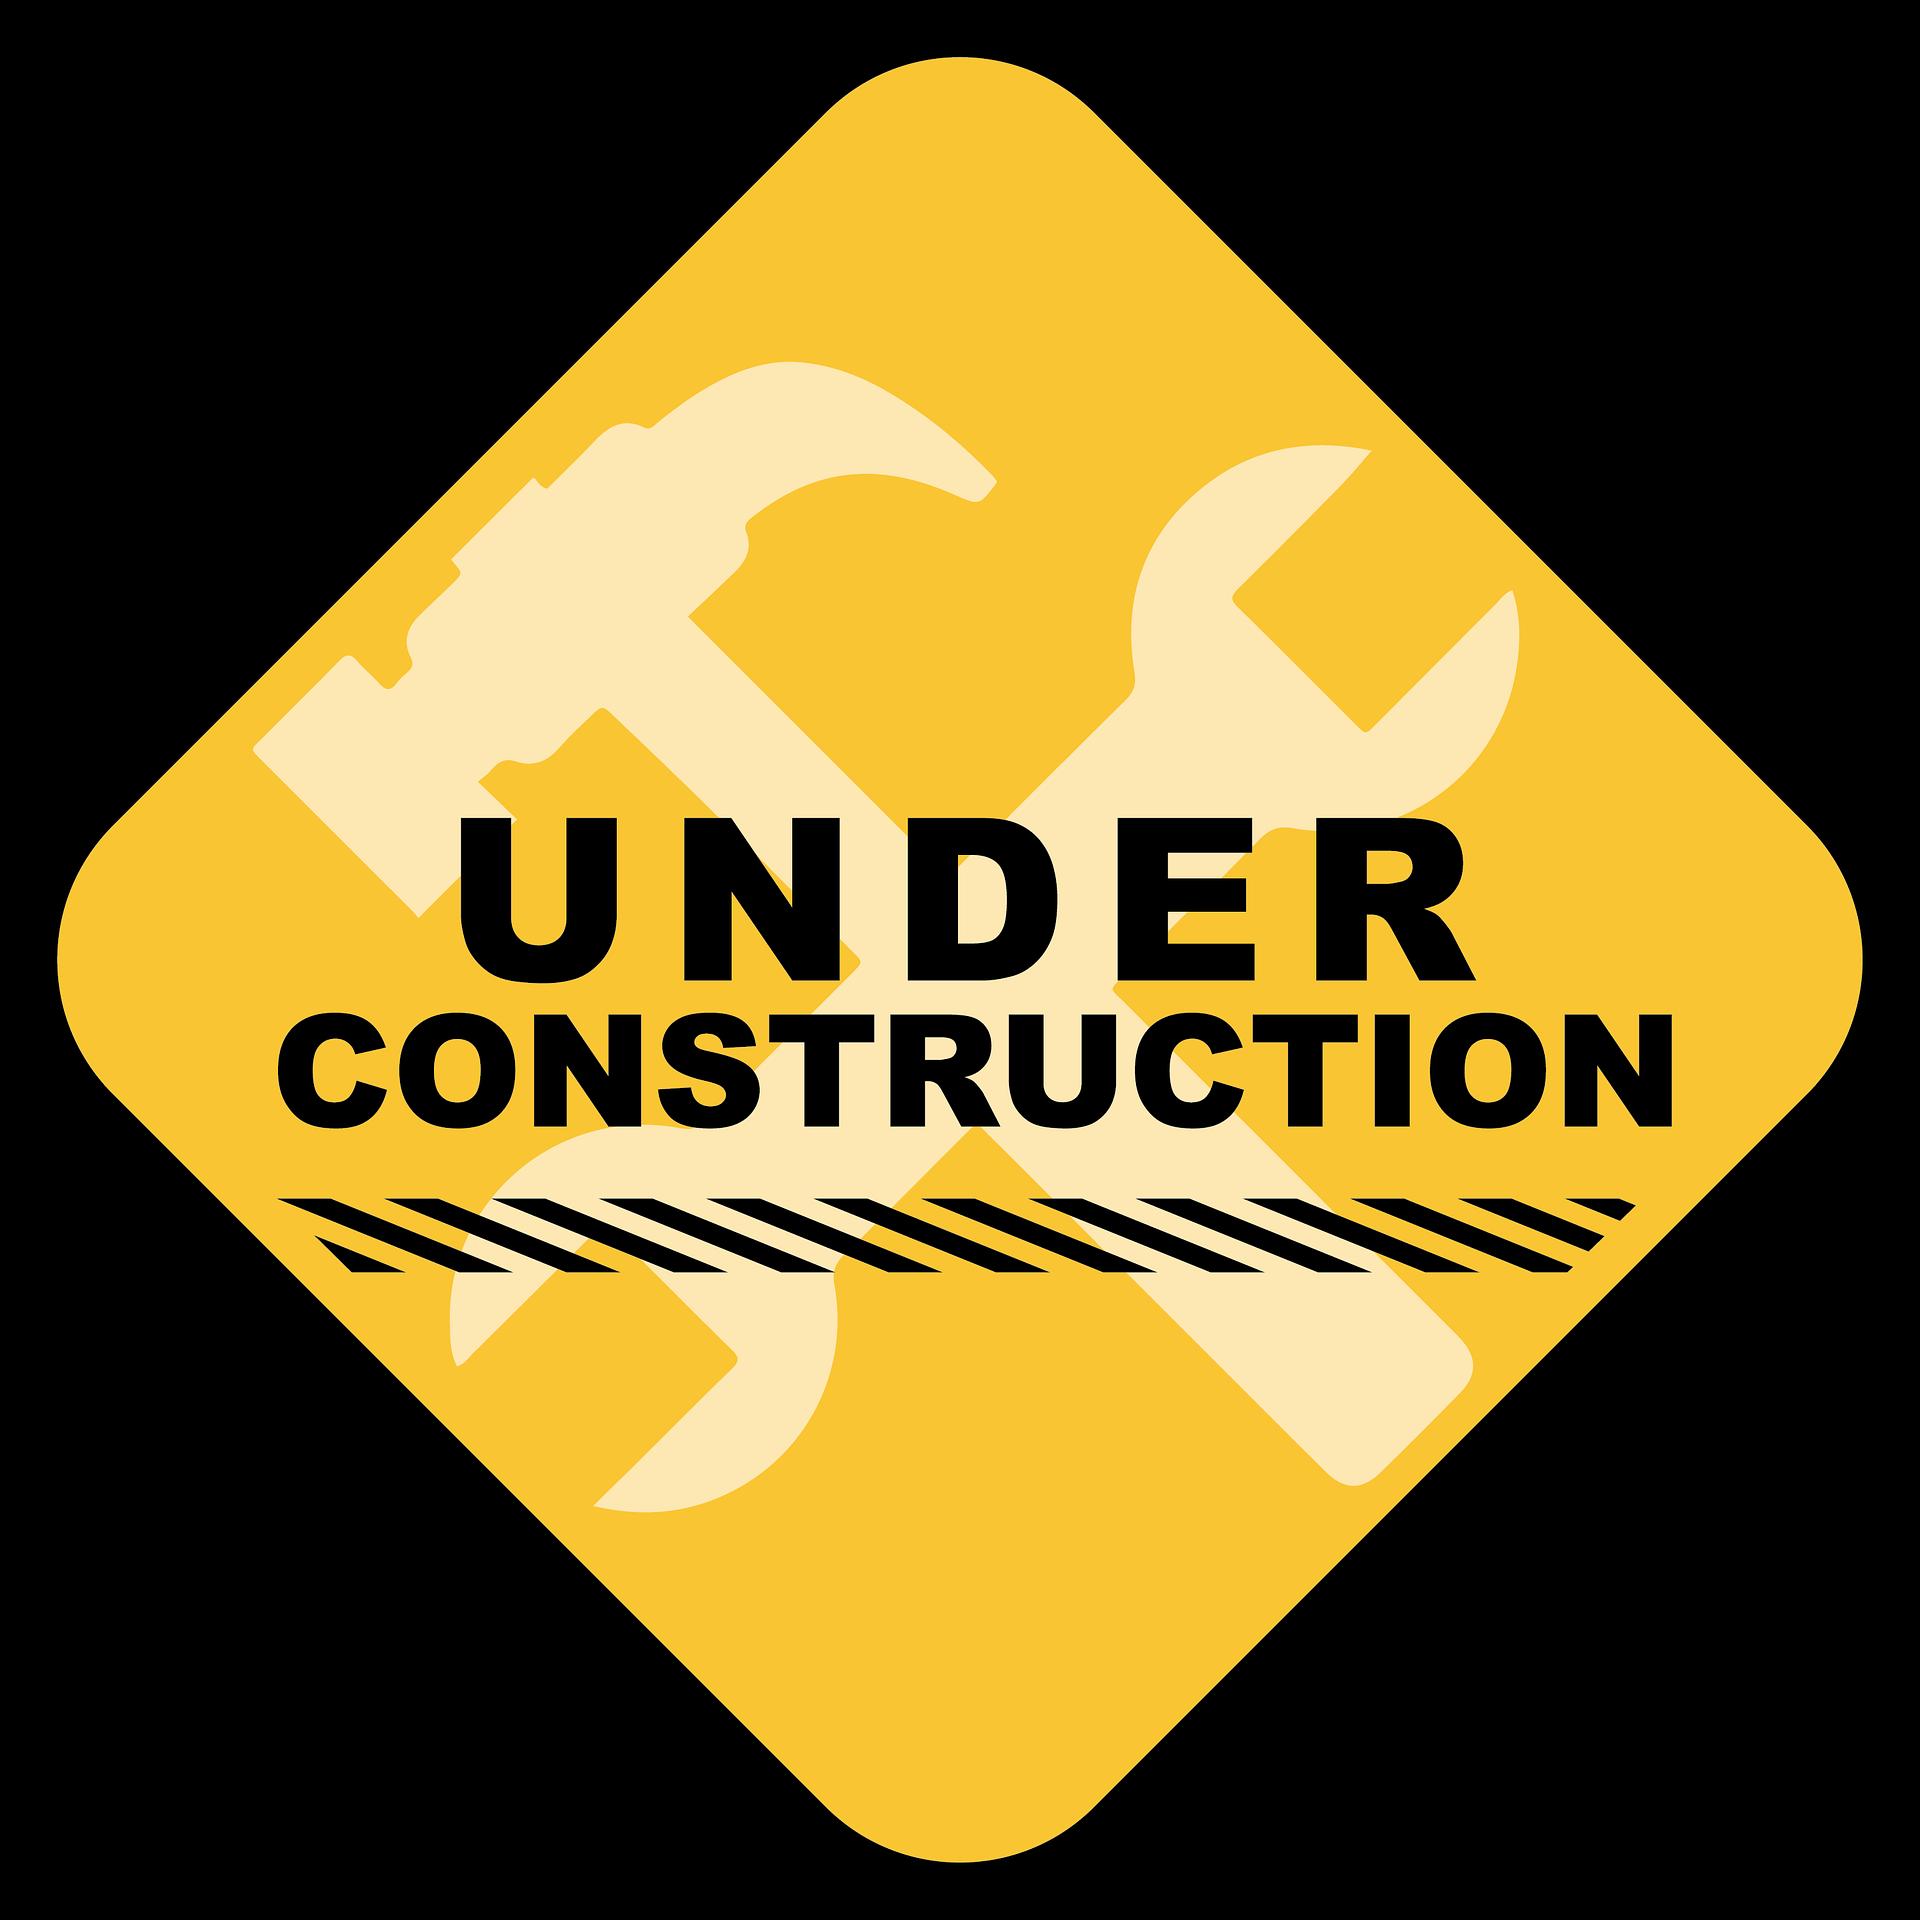 monopile gripper under construction